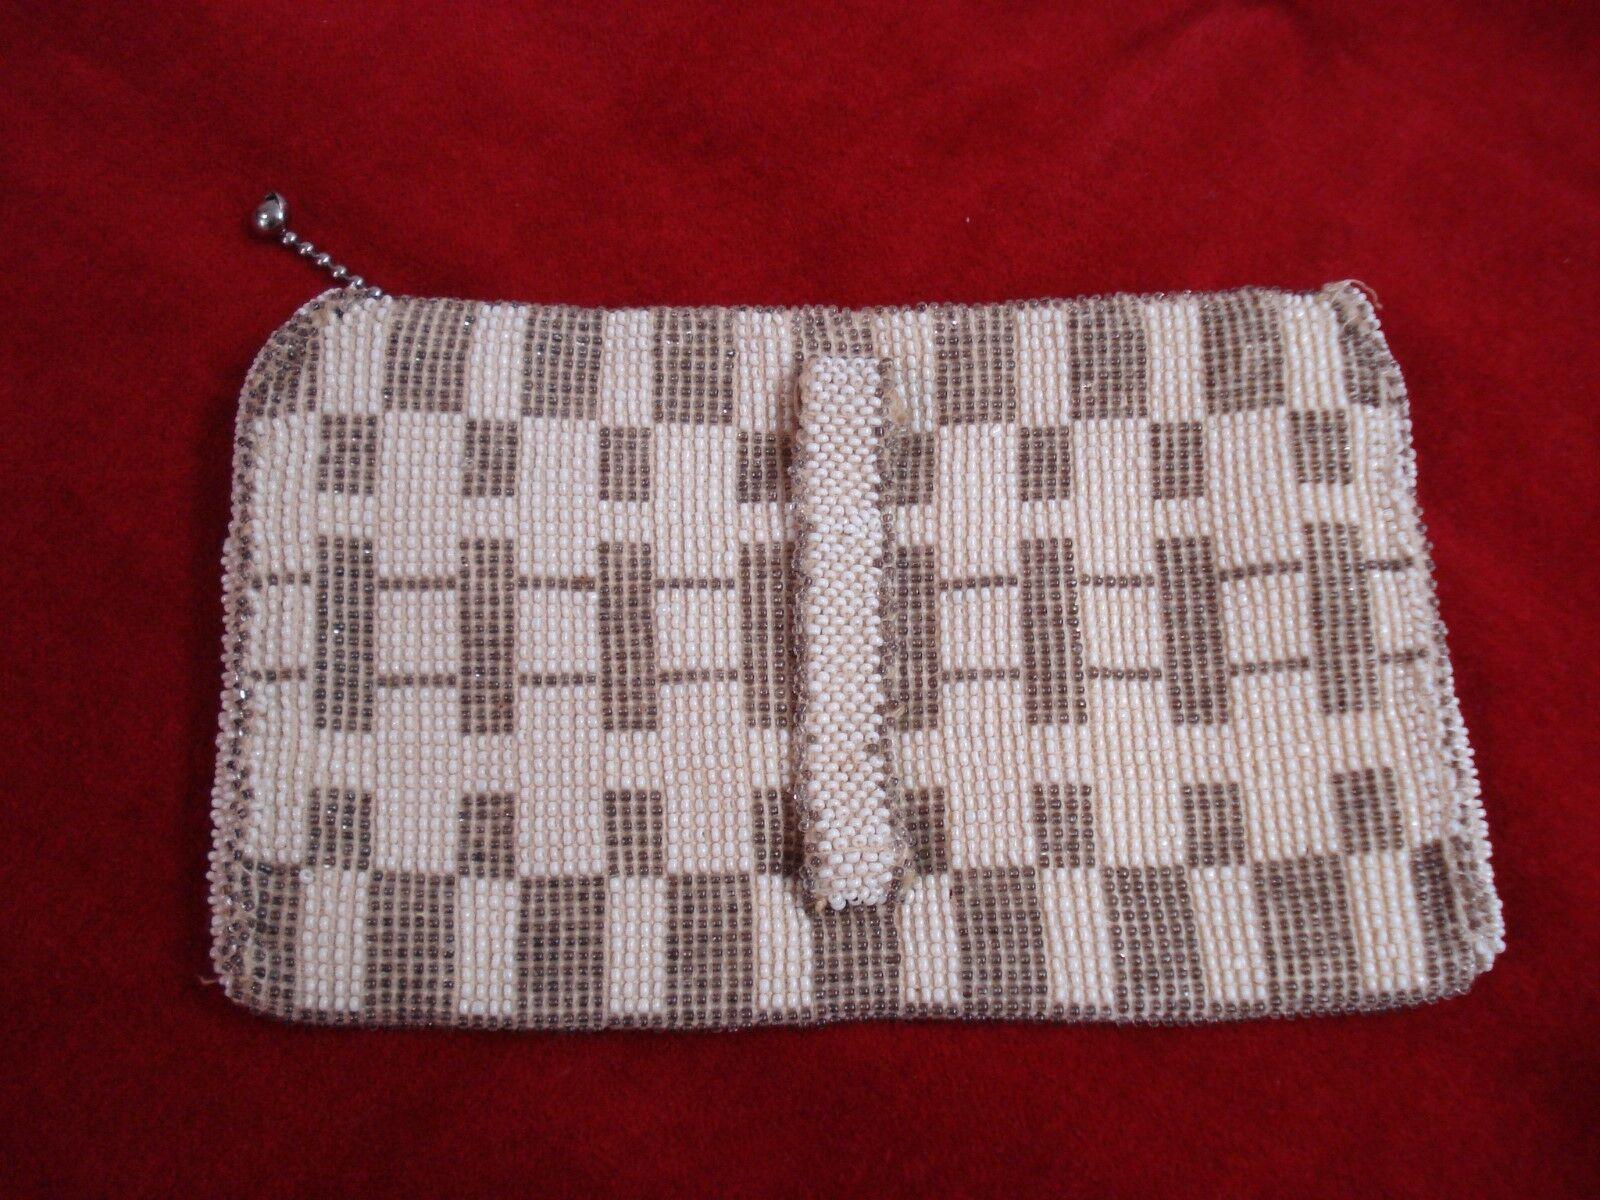 Vtg/Antique Small Clutch Evening Bag Czechoslovakia-MICRO GLASS BEADS-ART DECO